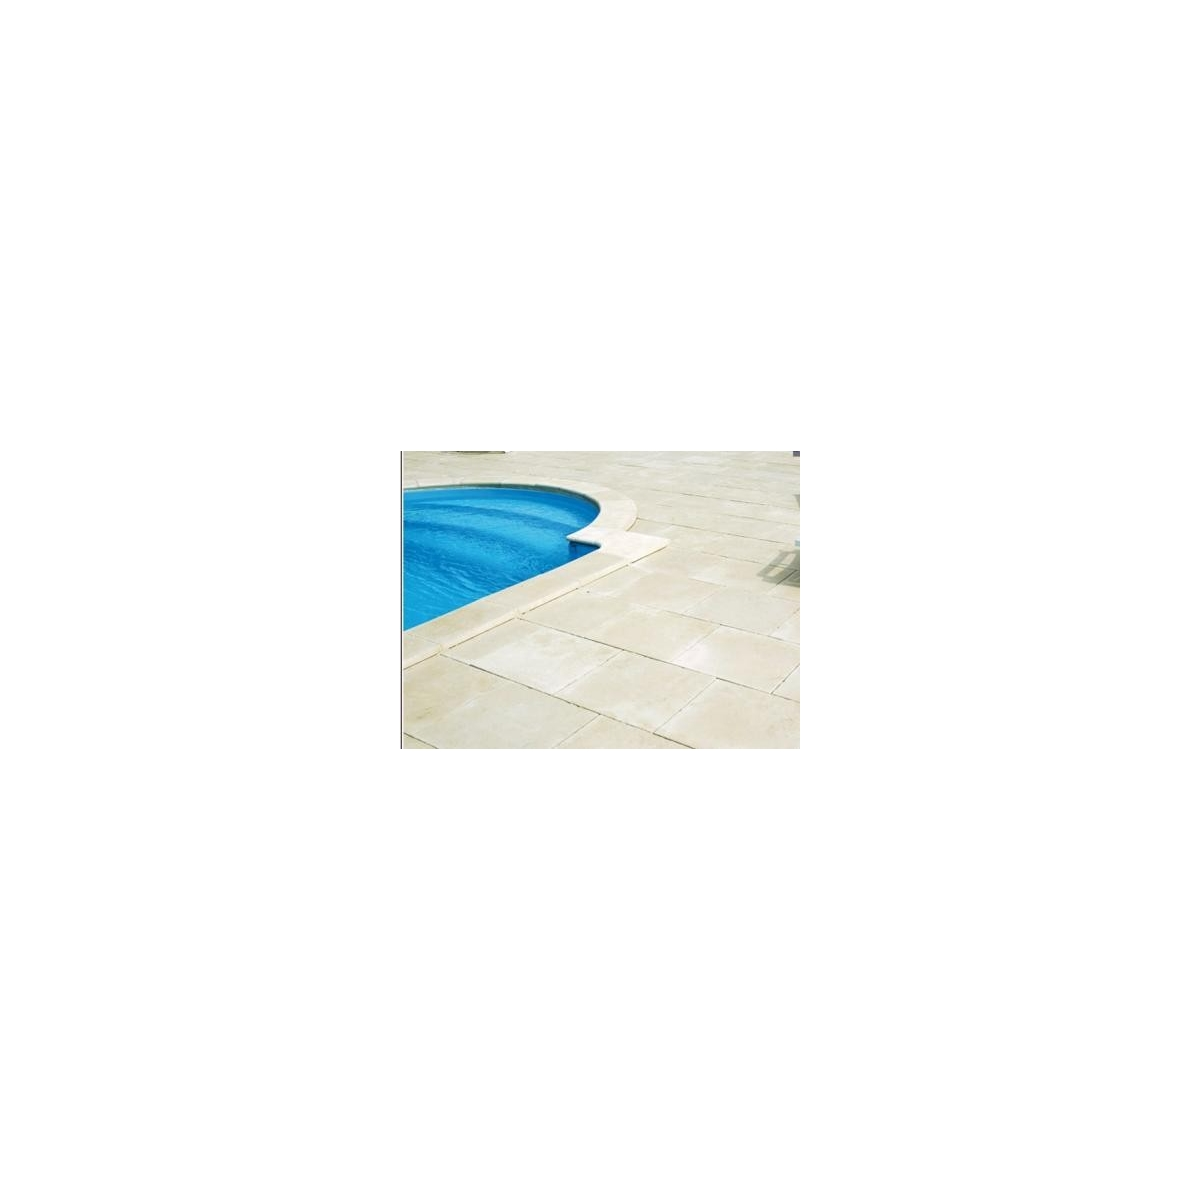 Losa plana para playa de piscina 50x50x3